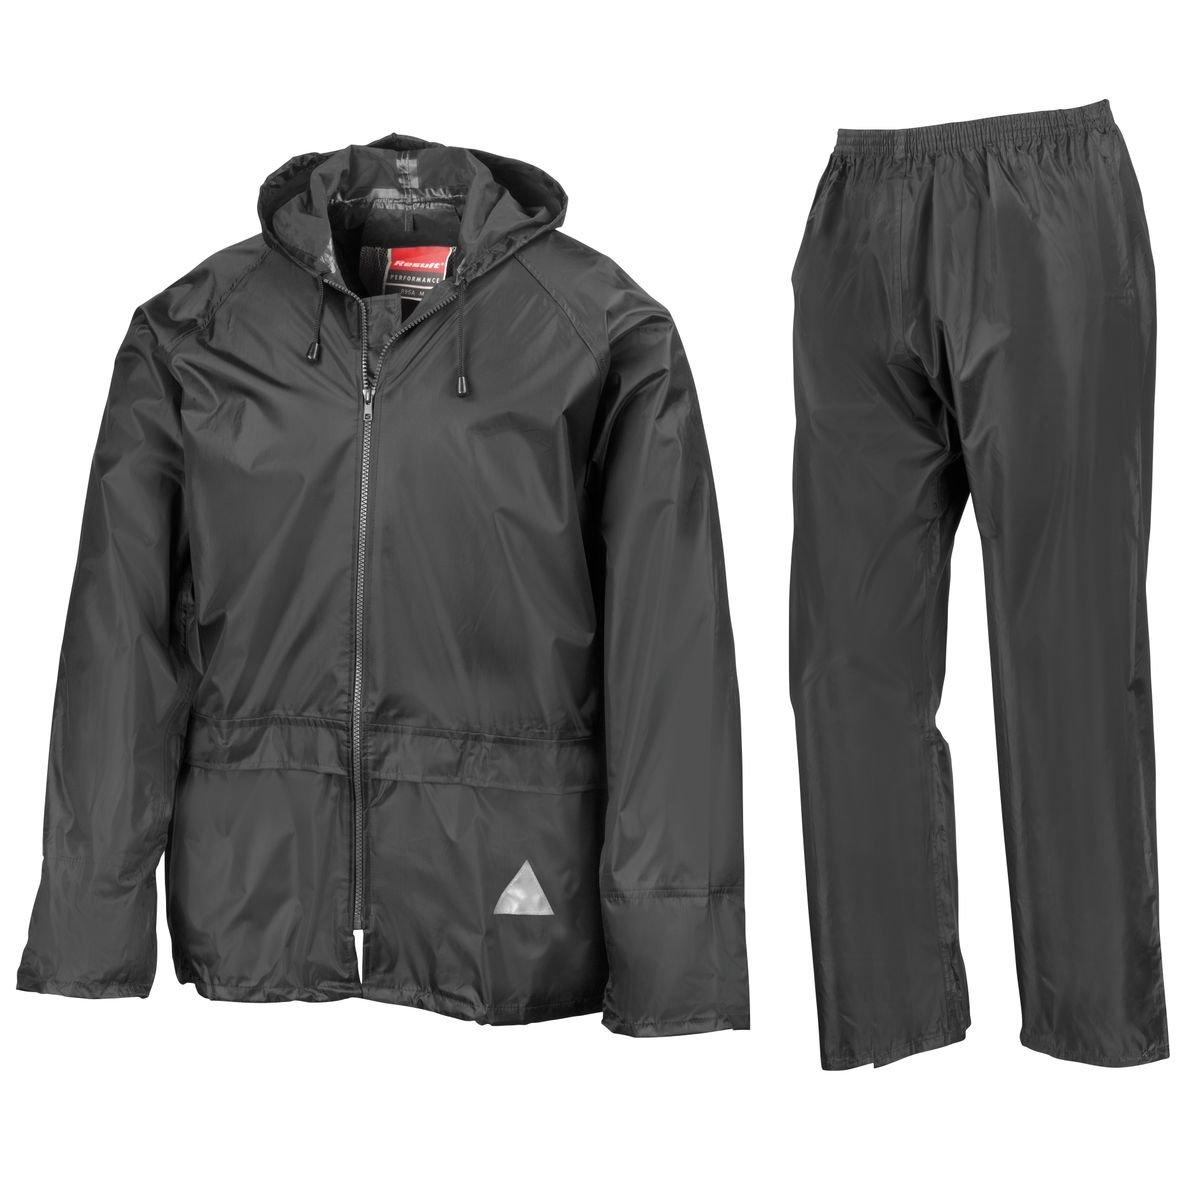 Result Heavyweight waterproof jacket//trouser suit